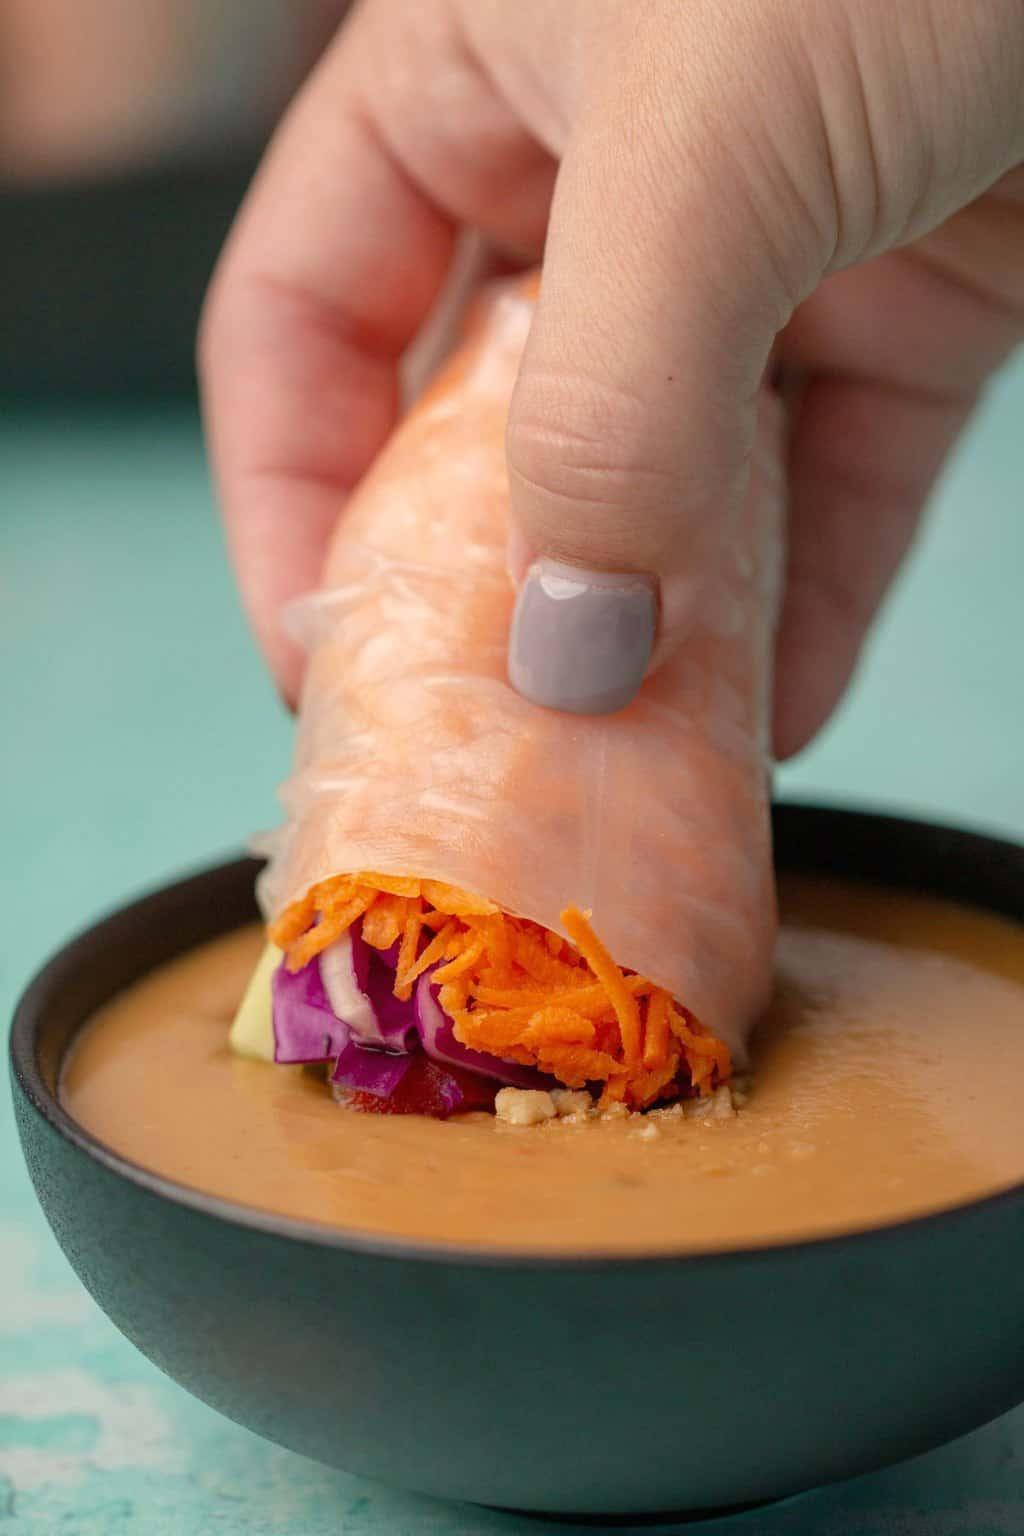 Vegan spring roll dipping into a bowl of vegan peanut sauce.